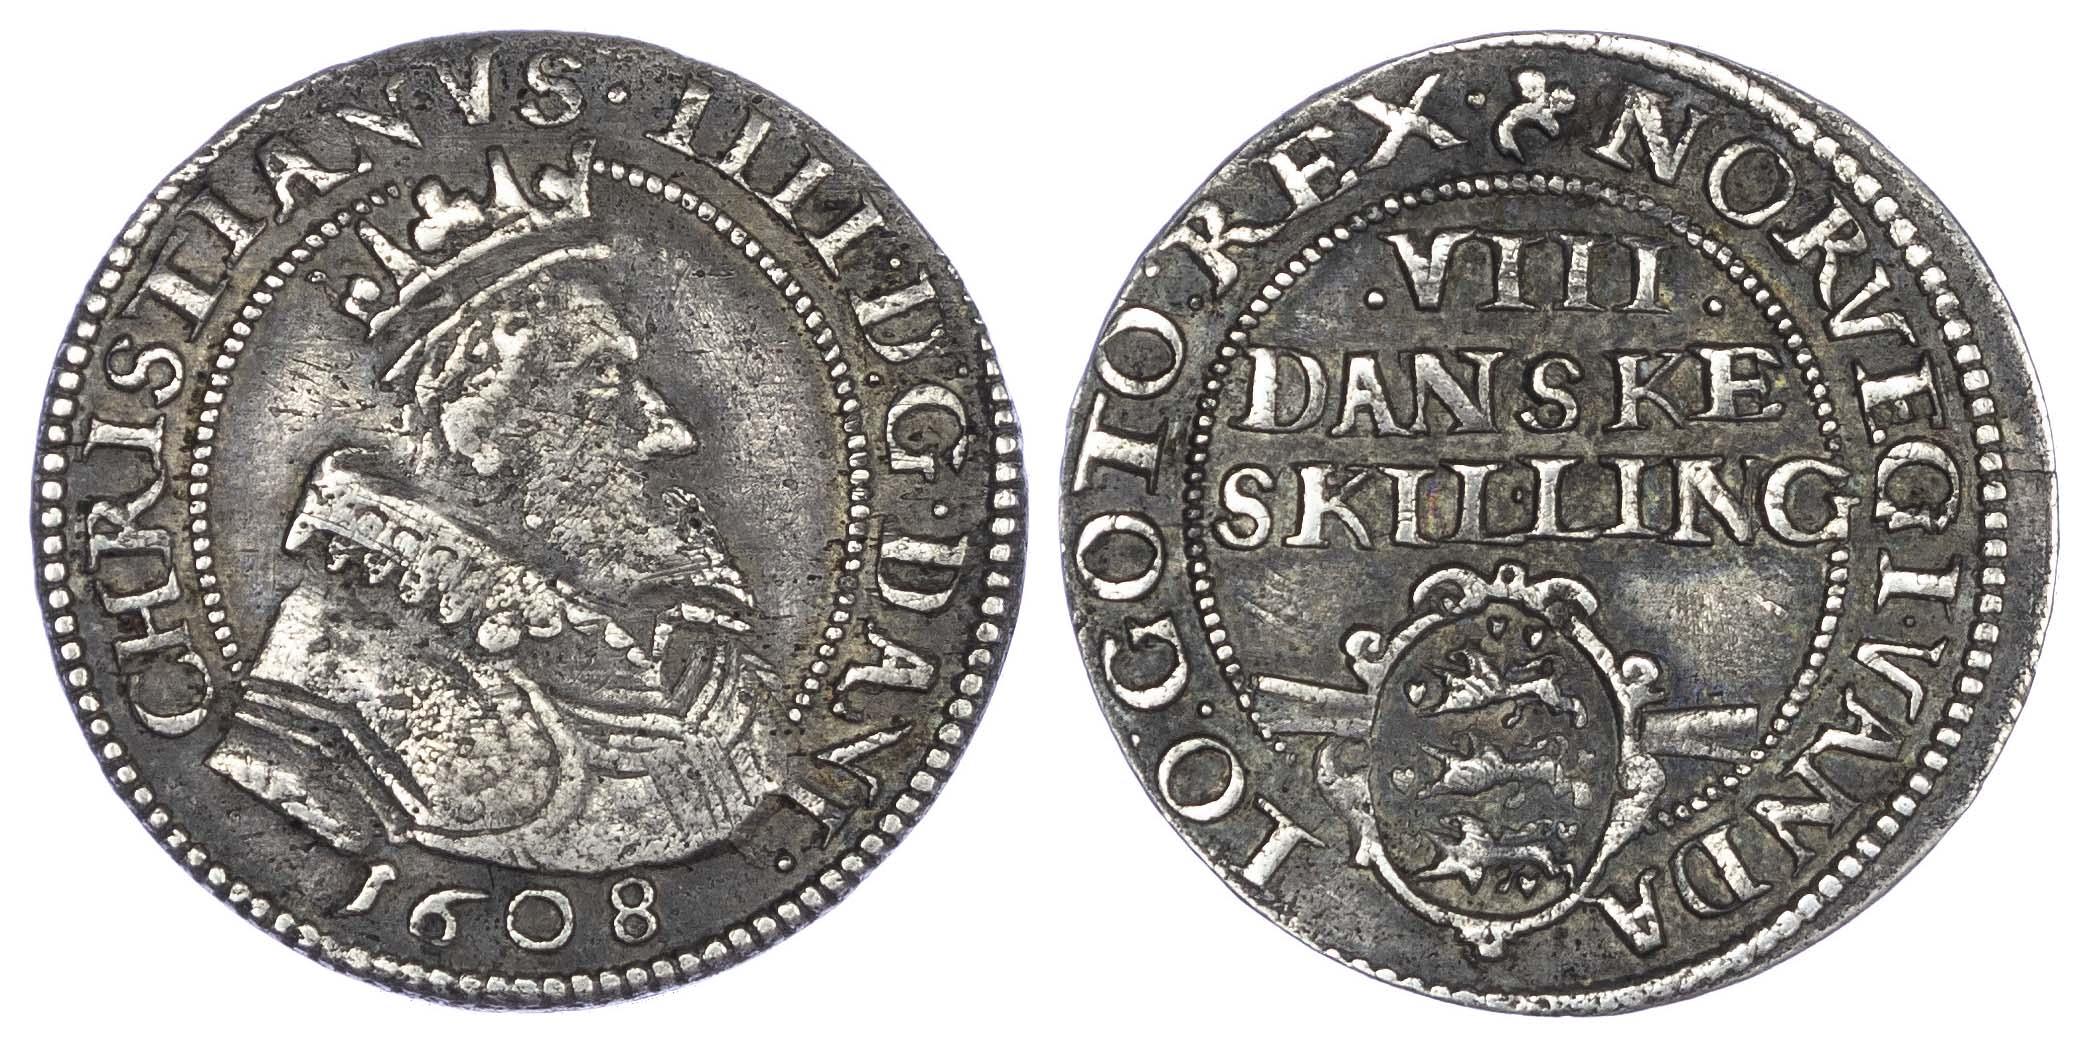 Denmark, Christian IV (1588-1648 AD), silver 8 Skilling, 1608 AD